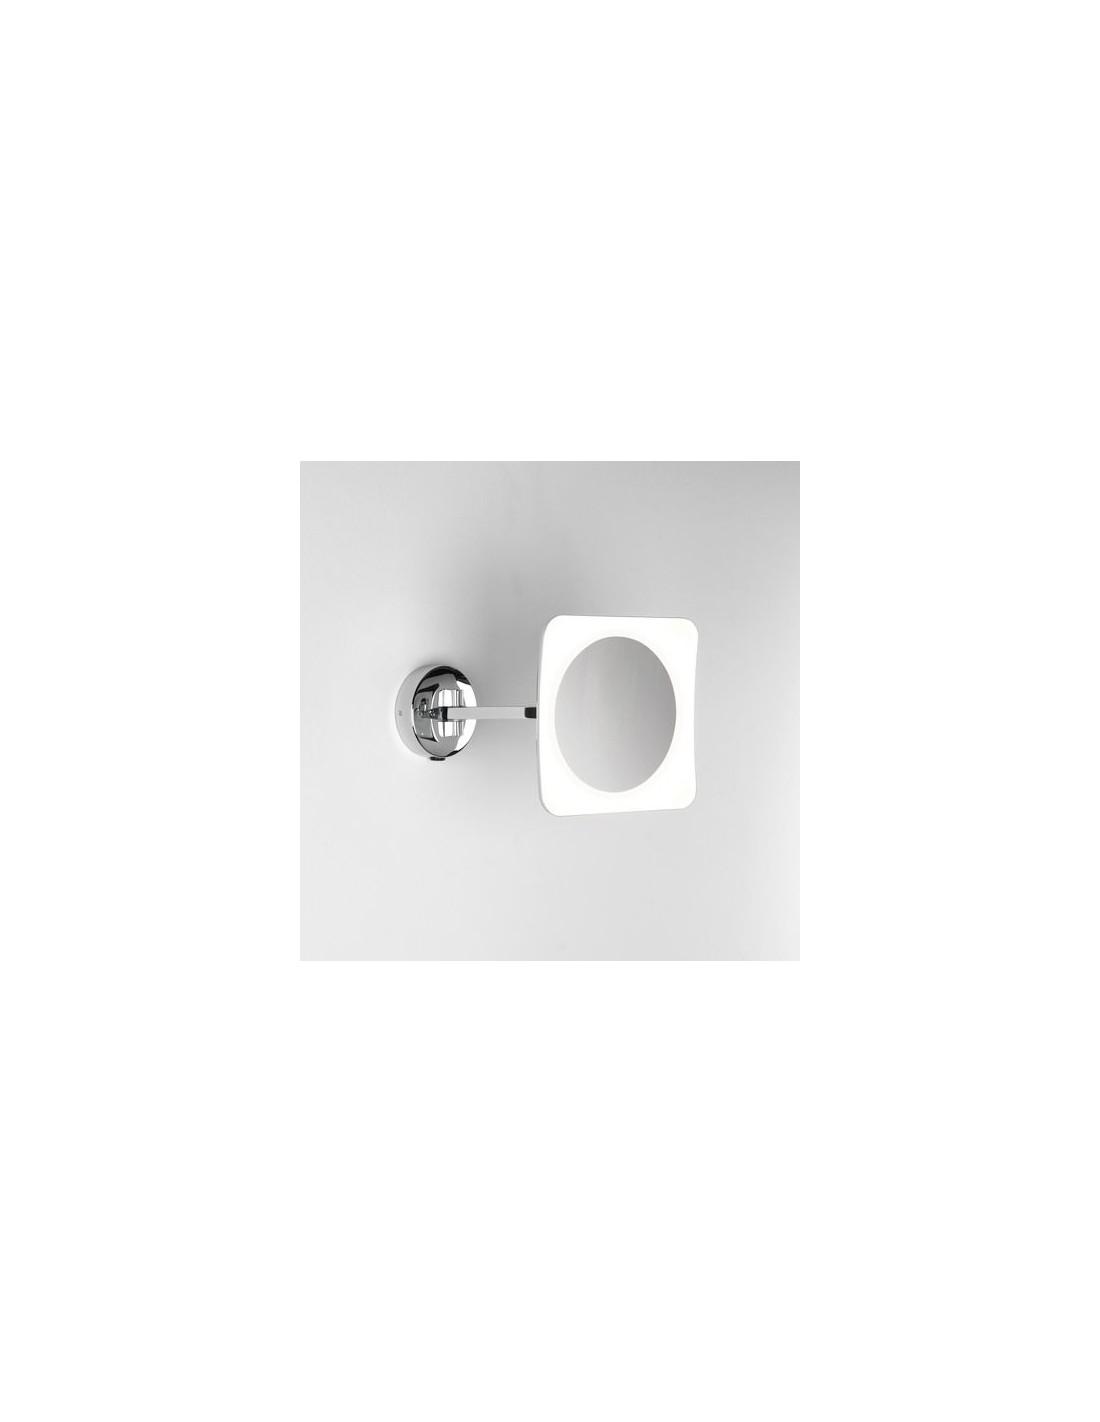 Miroir Mascali Square LED Astro Lighting - Valente Design